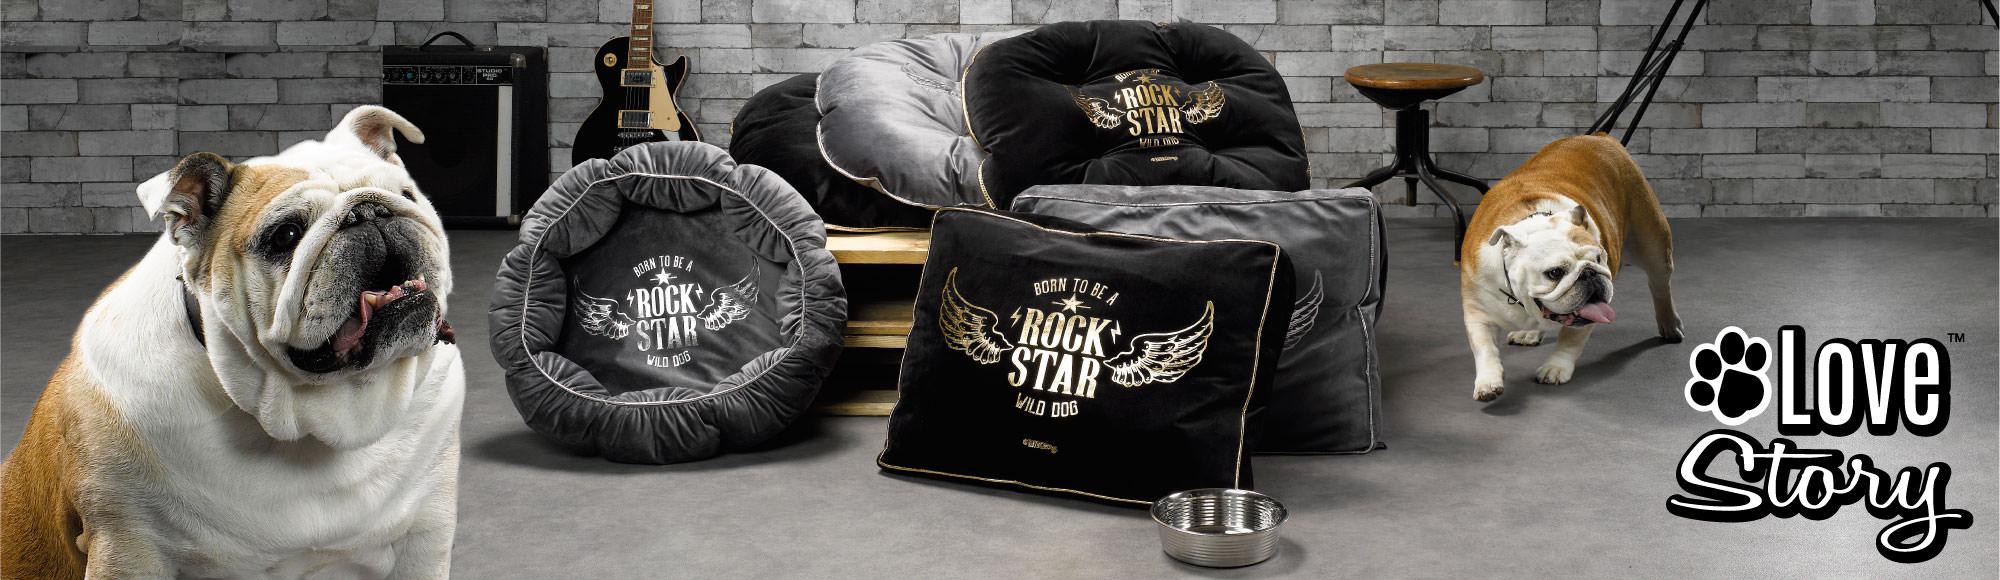 U10 – Love story brand – Pet shop – Rock Angel theme – Mats, cushions, toys, bowls…